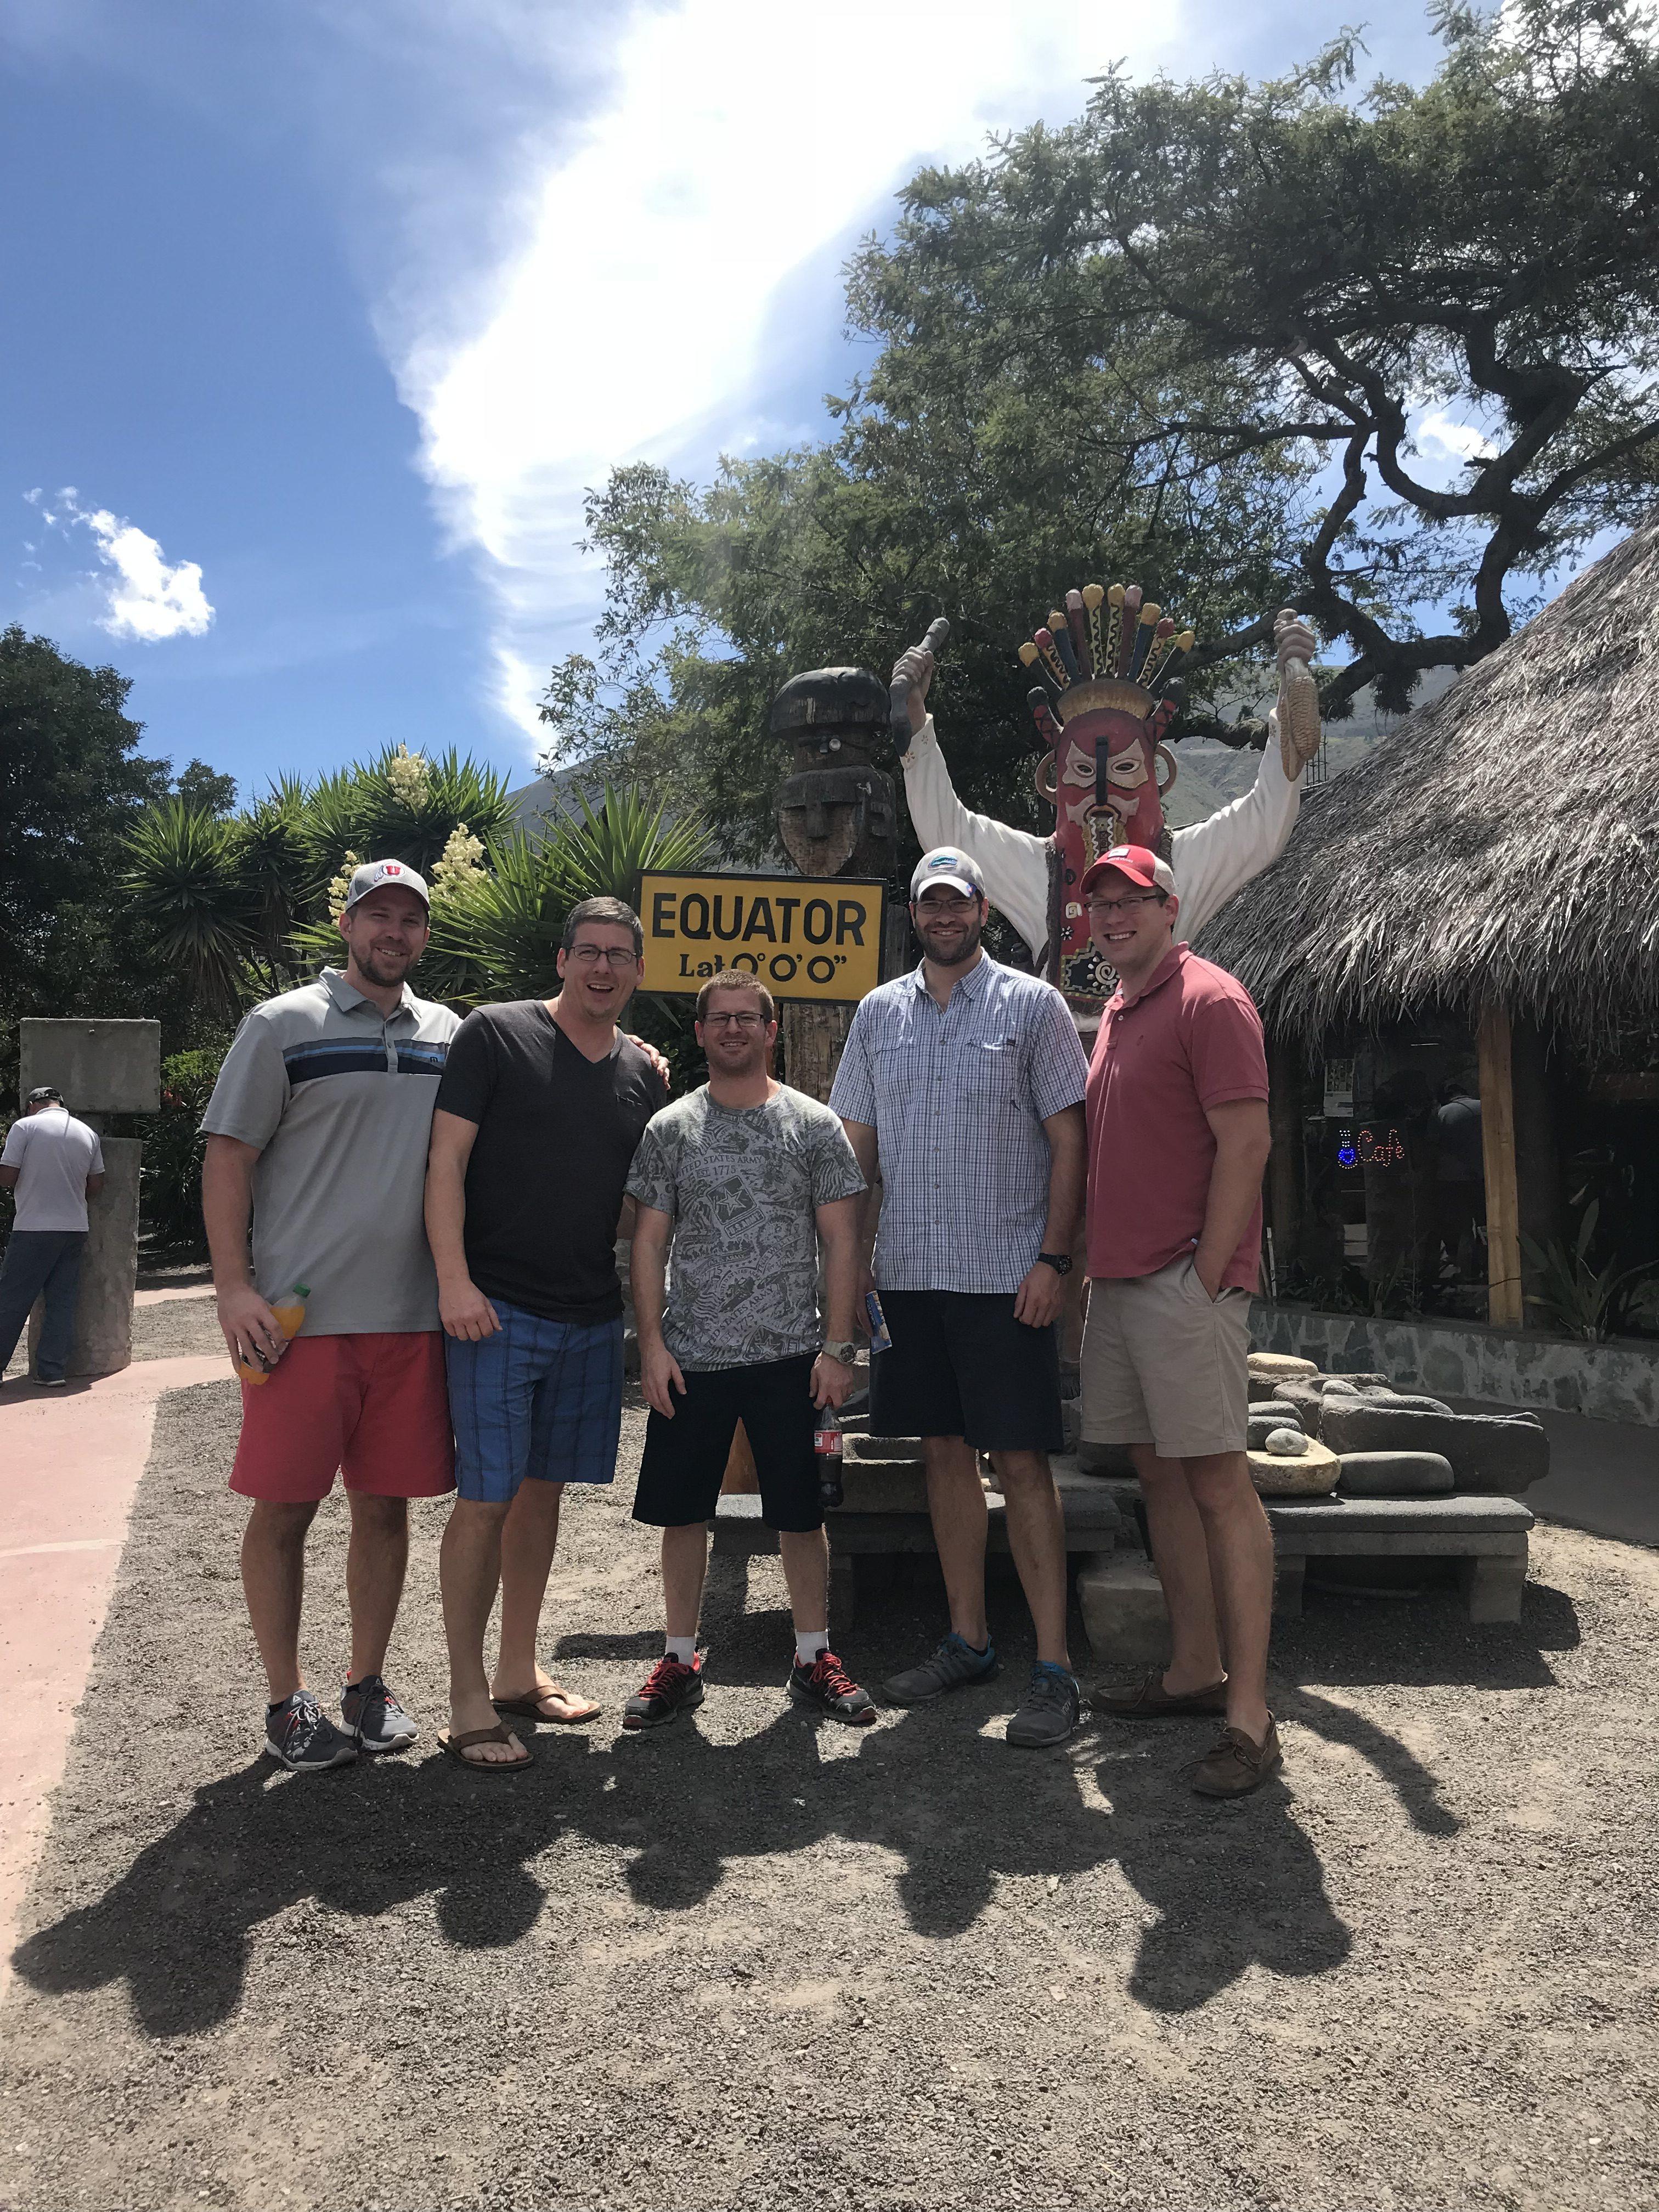 Team at the Equator